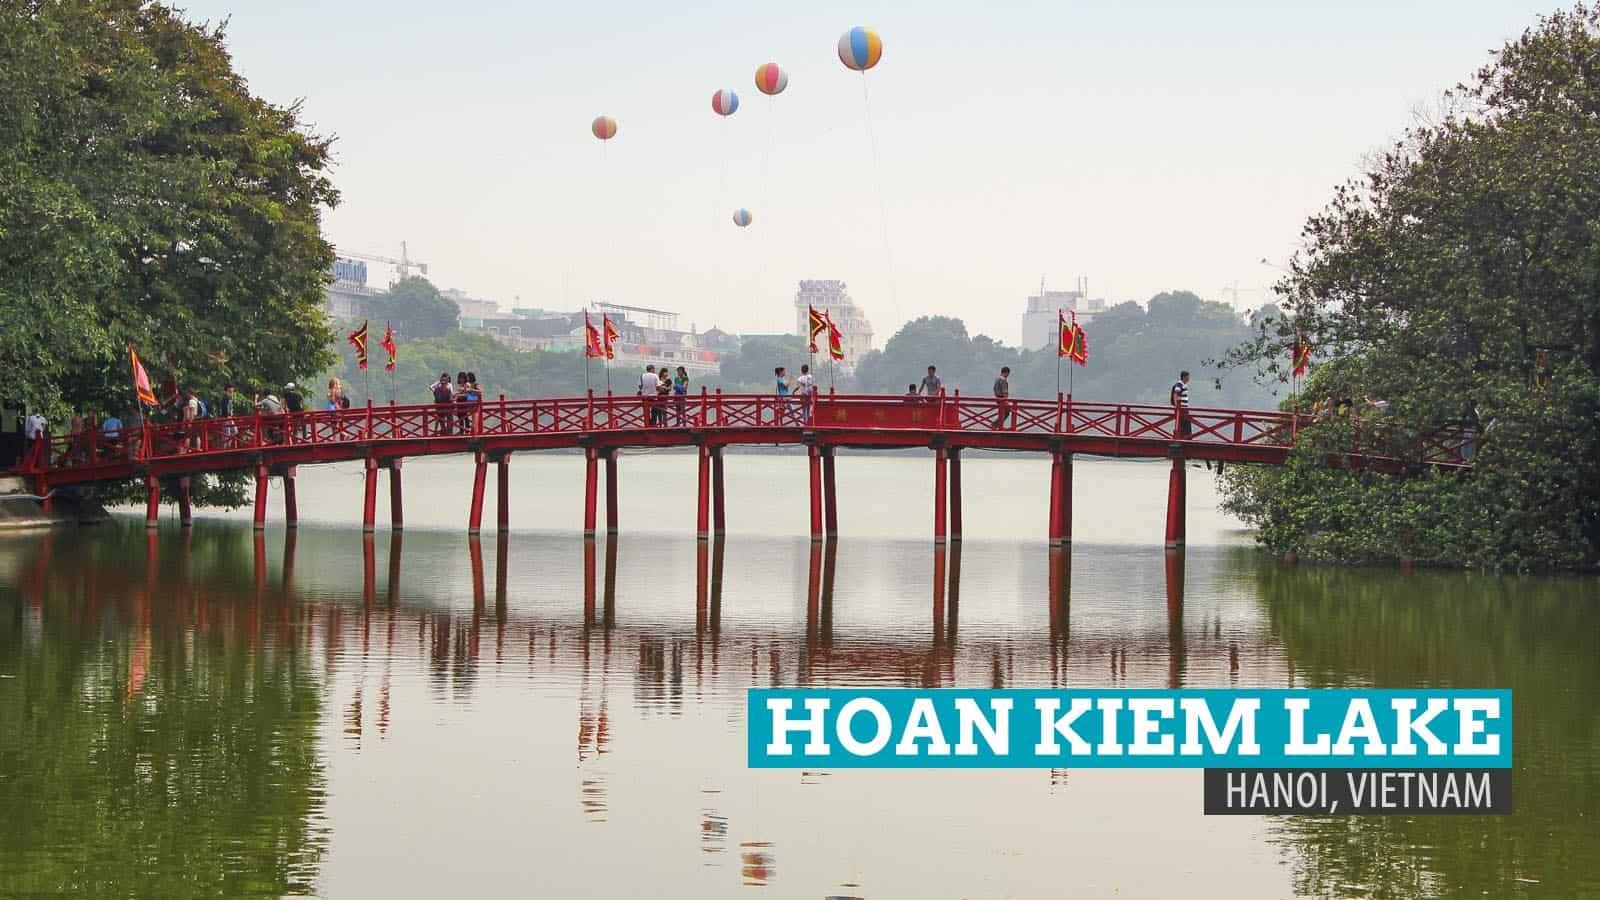 Hoan Kiem Lake: The Legend of the Restored Sword of Hanoi, Vietnam